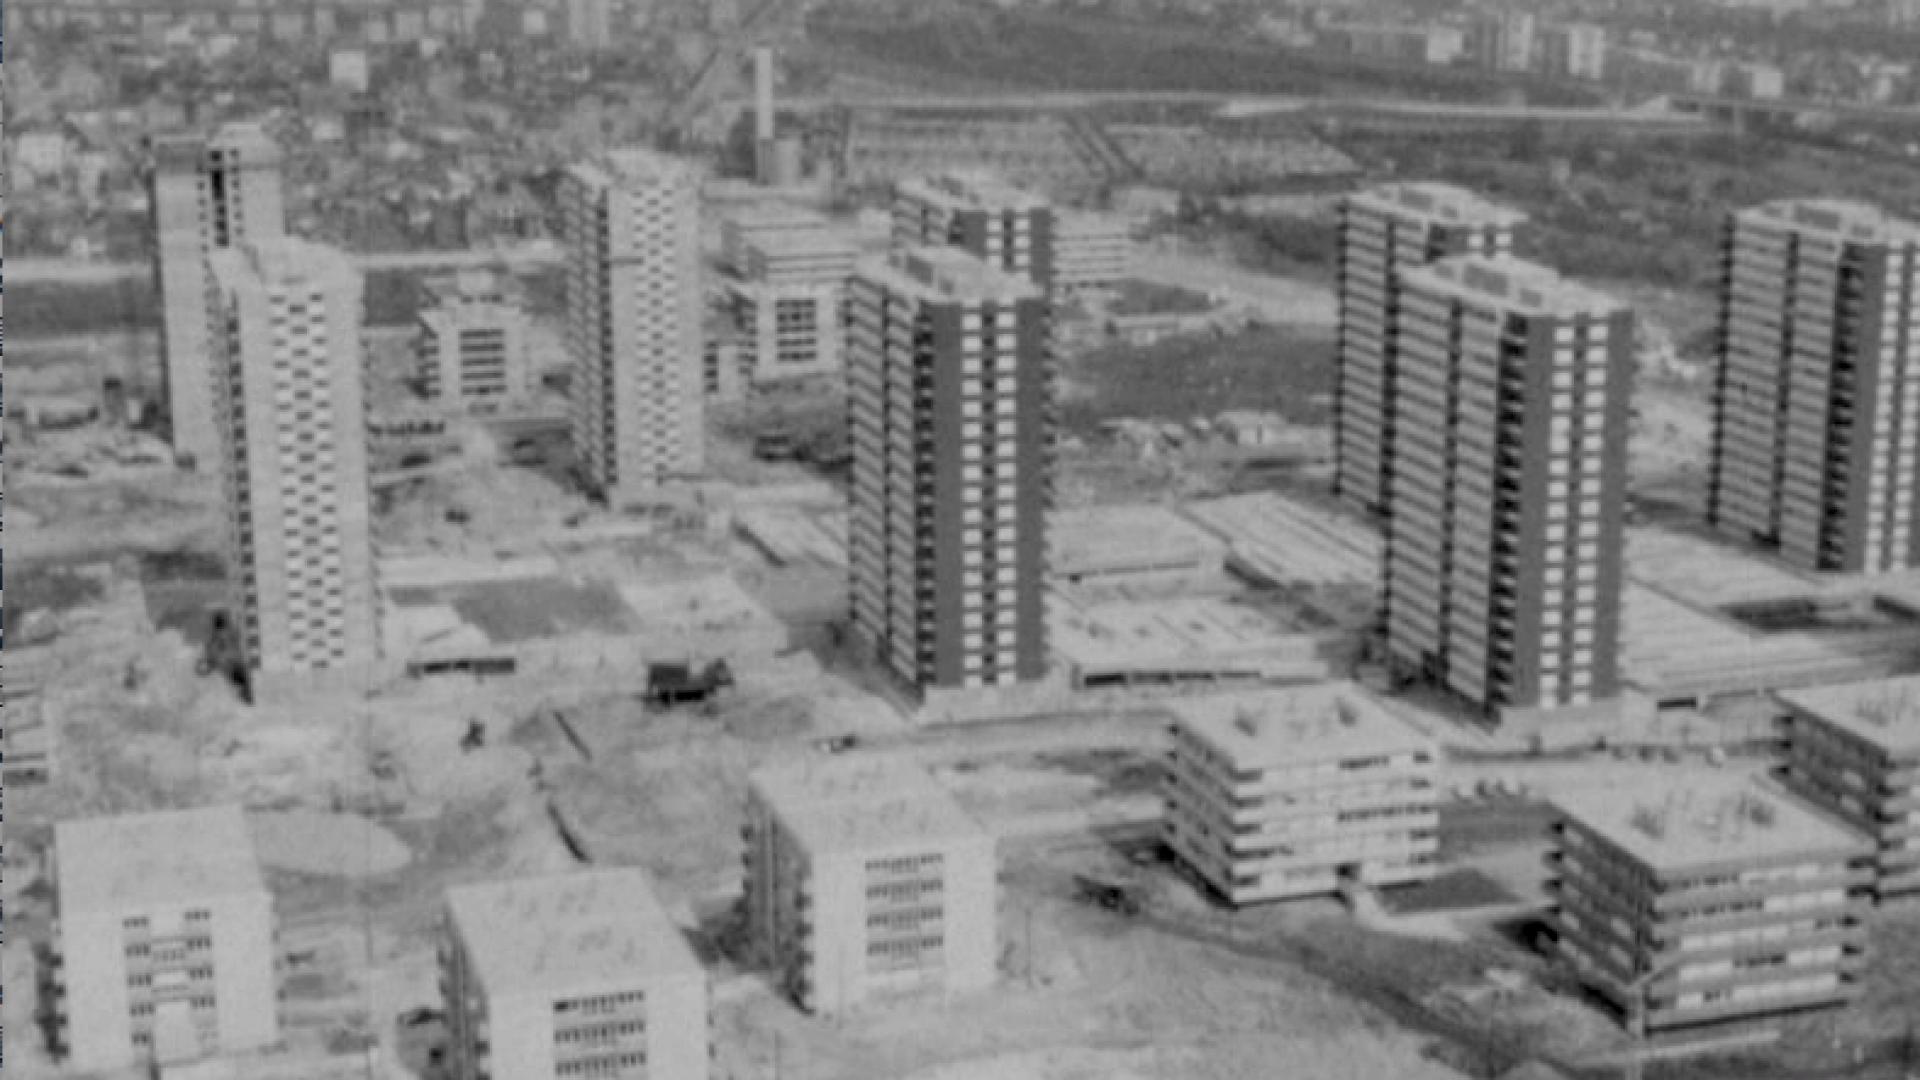 cropped-CineA-1974-263-FontenayNotr-8_8.png